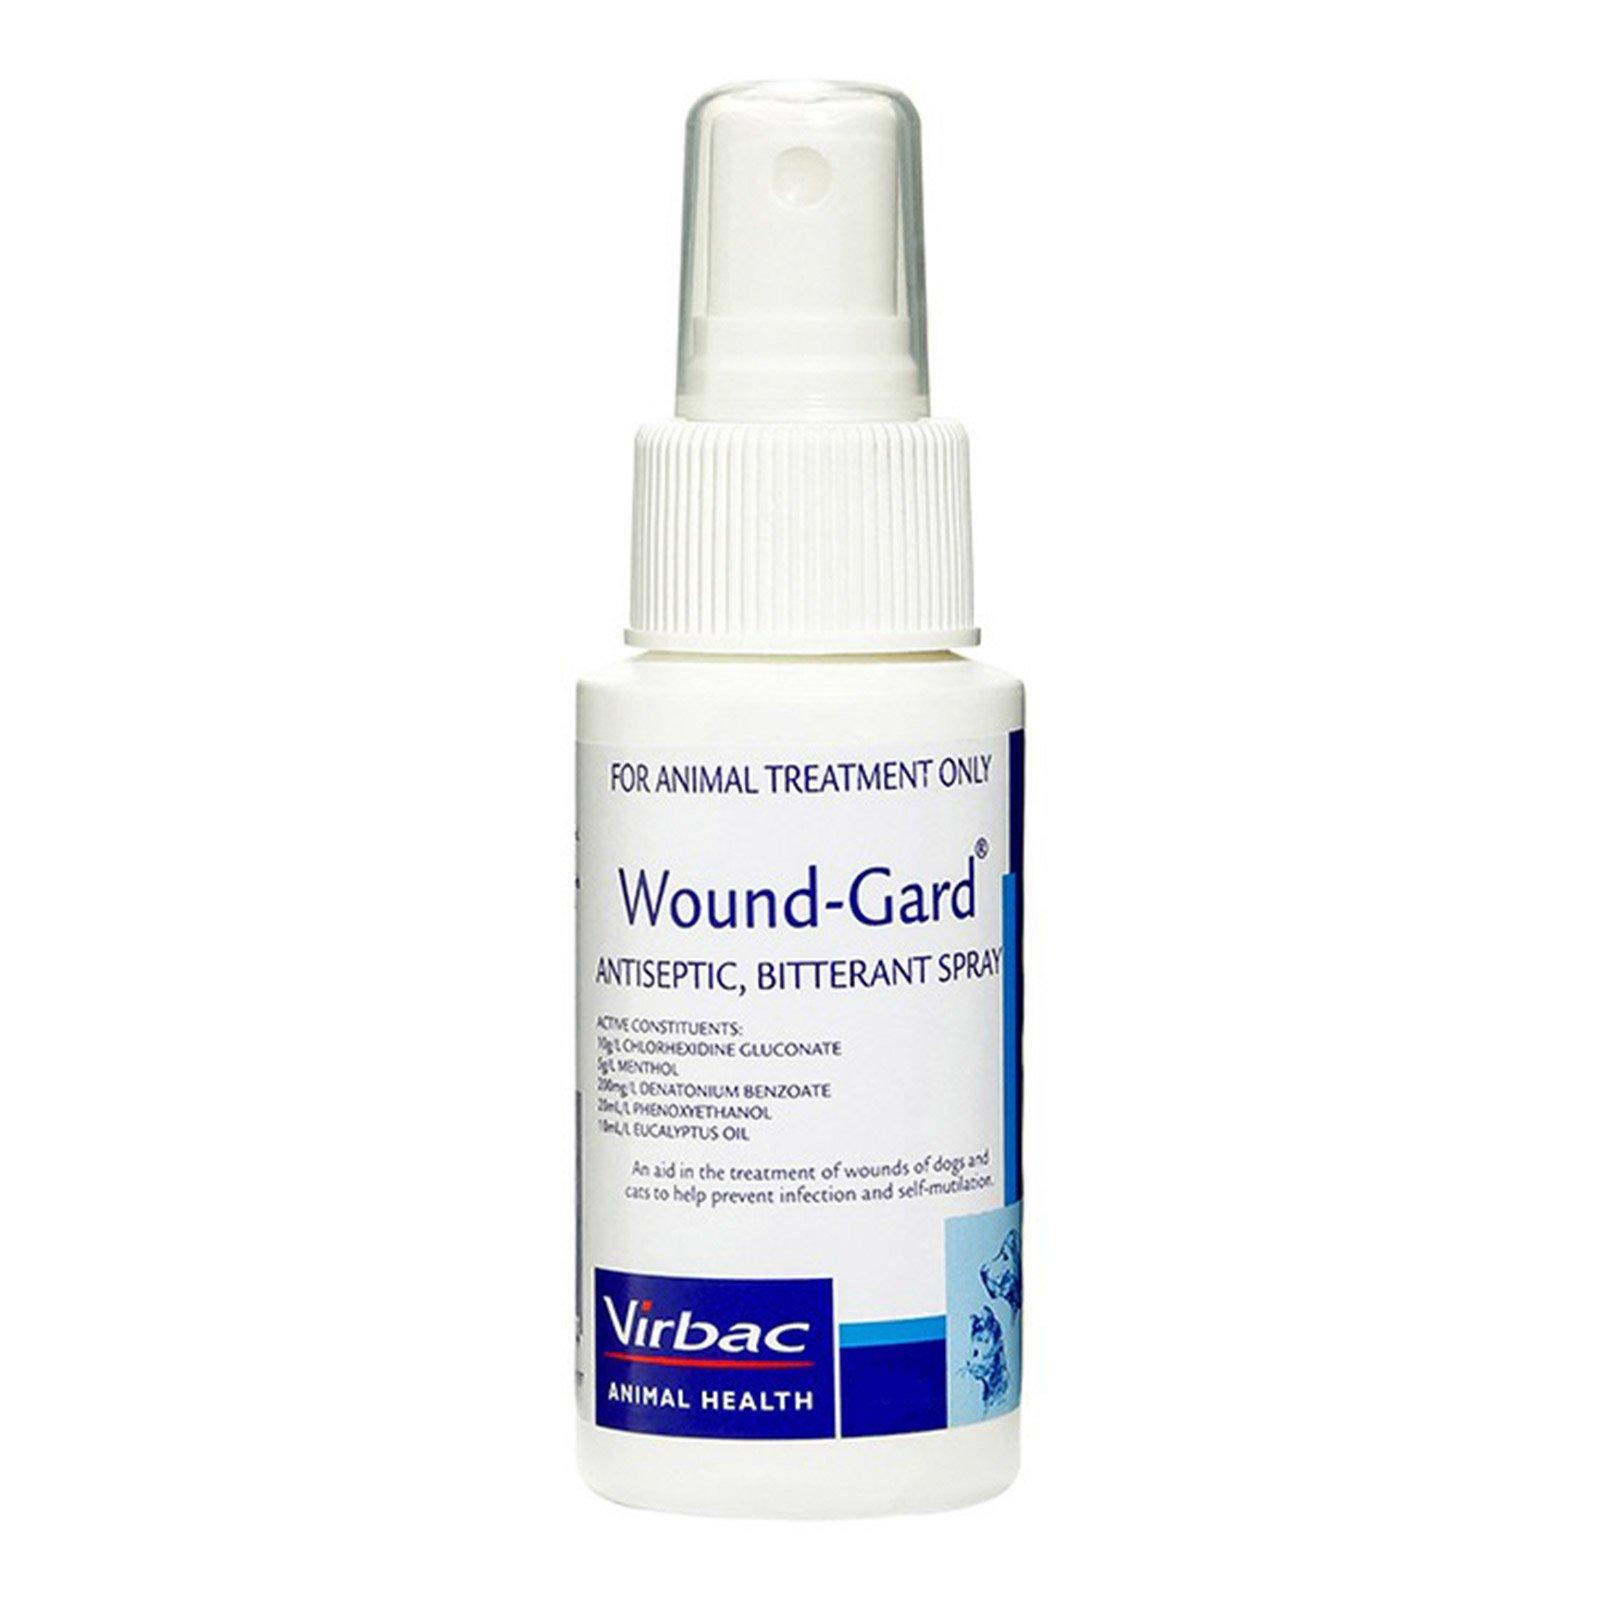 Virbac Wound-Gard Spray